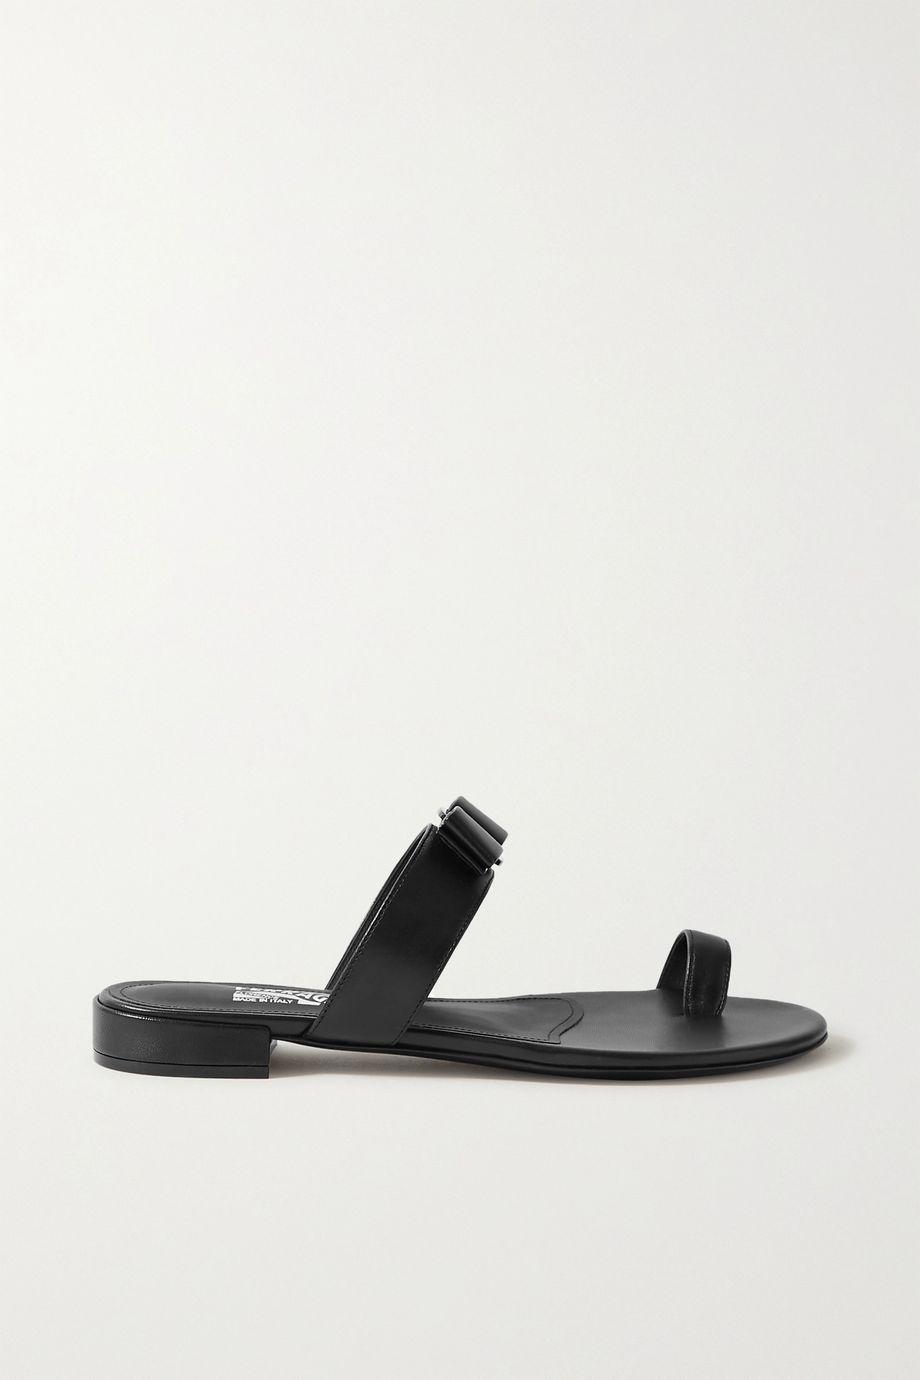 Salvatore Ferragamo Louisa bow-embellished leather slides